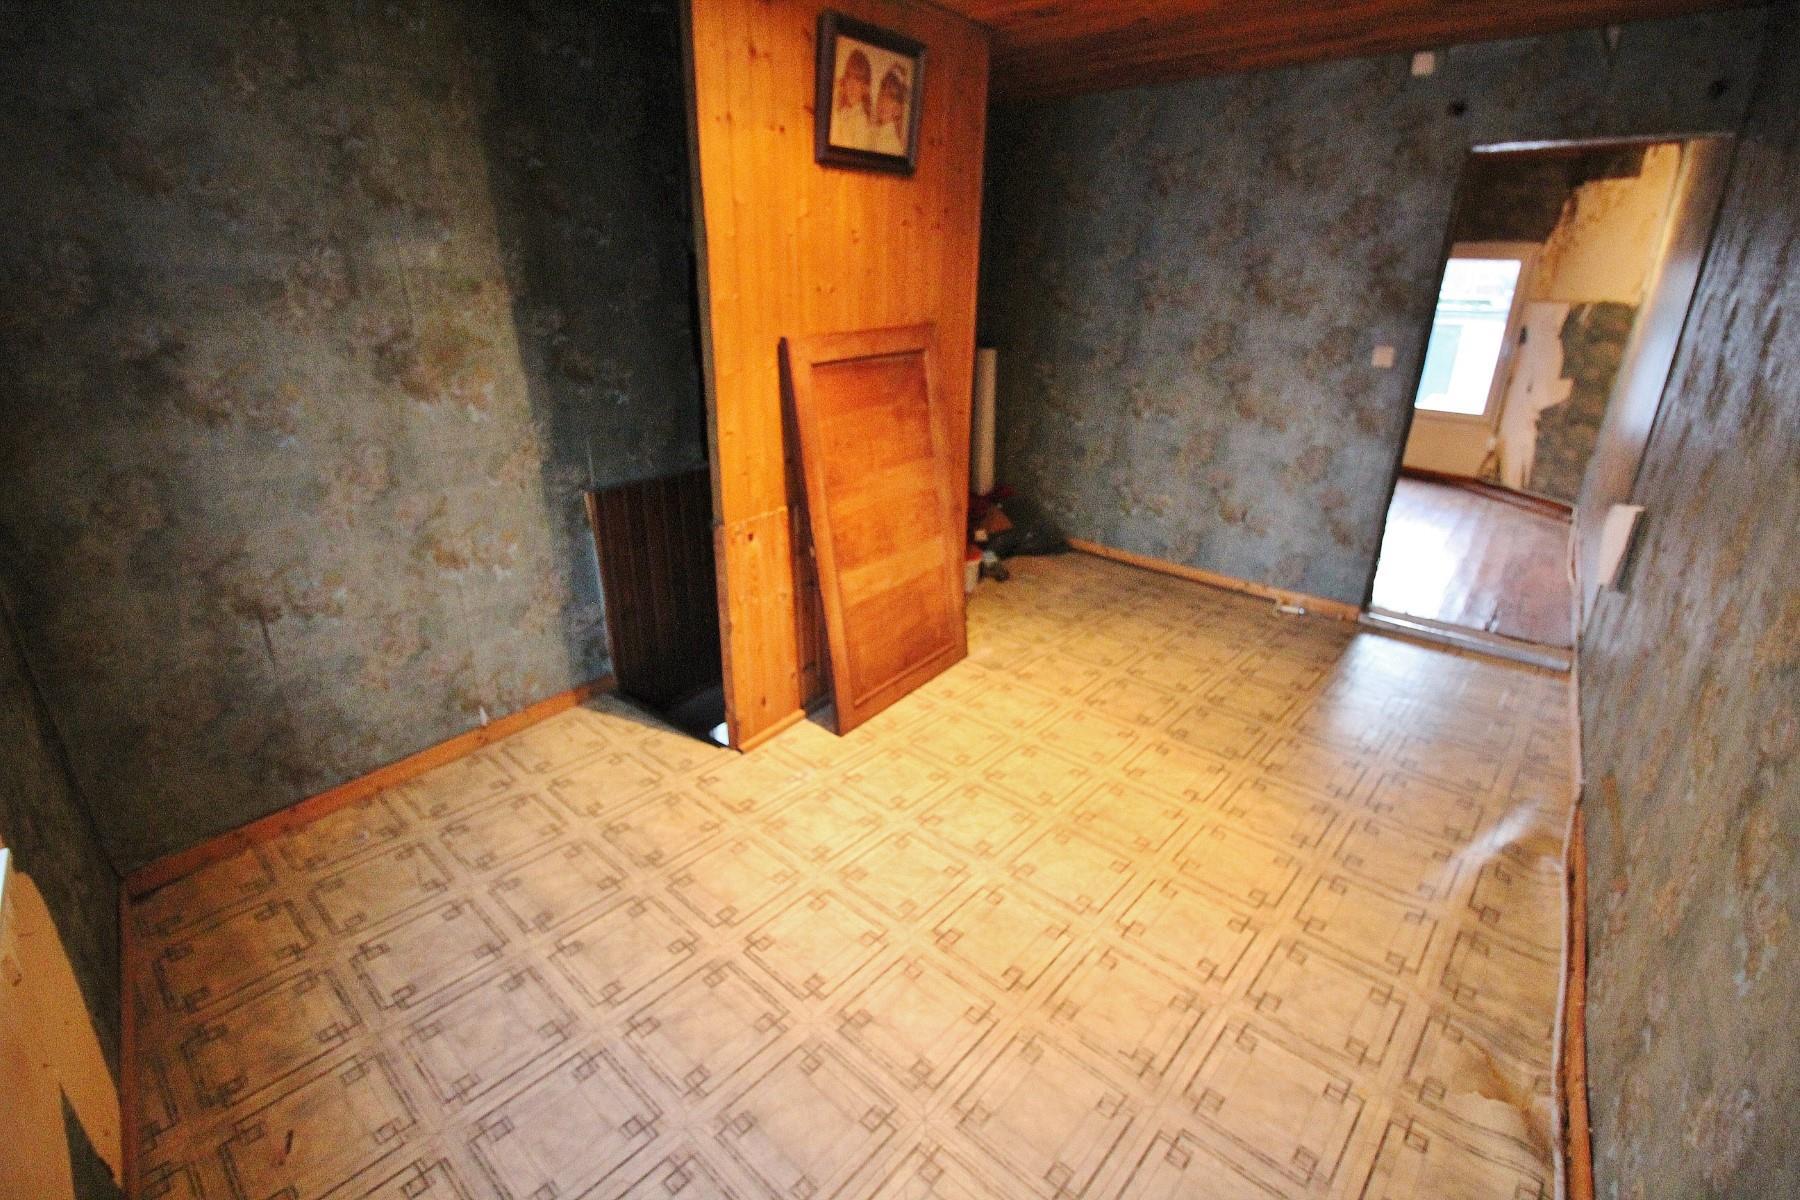 Maison - Beyne-Heusay Bellaire - #3946189-13